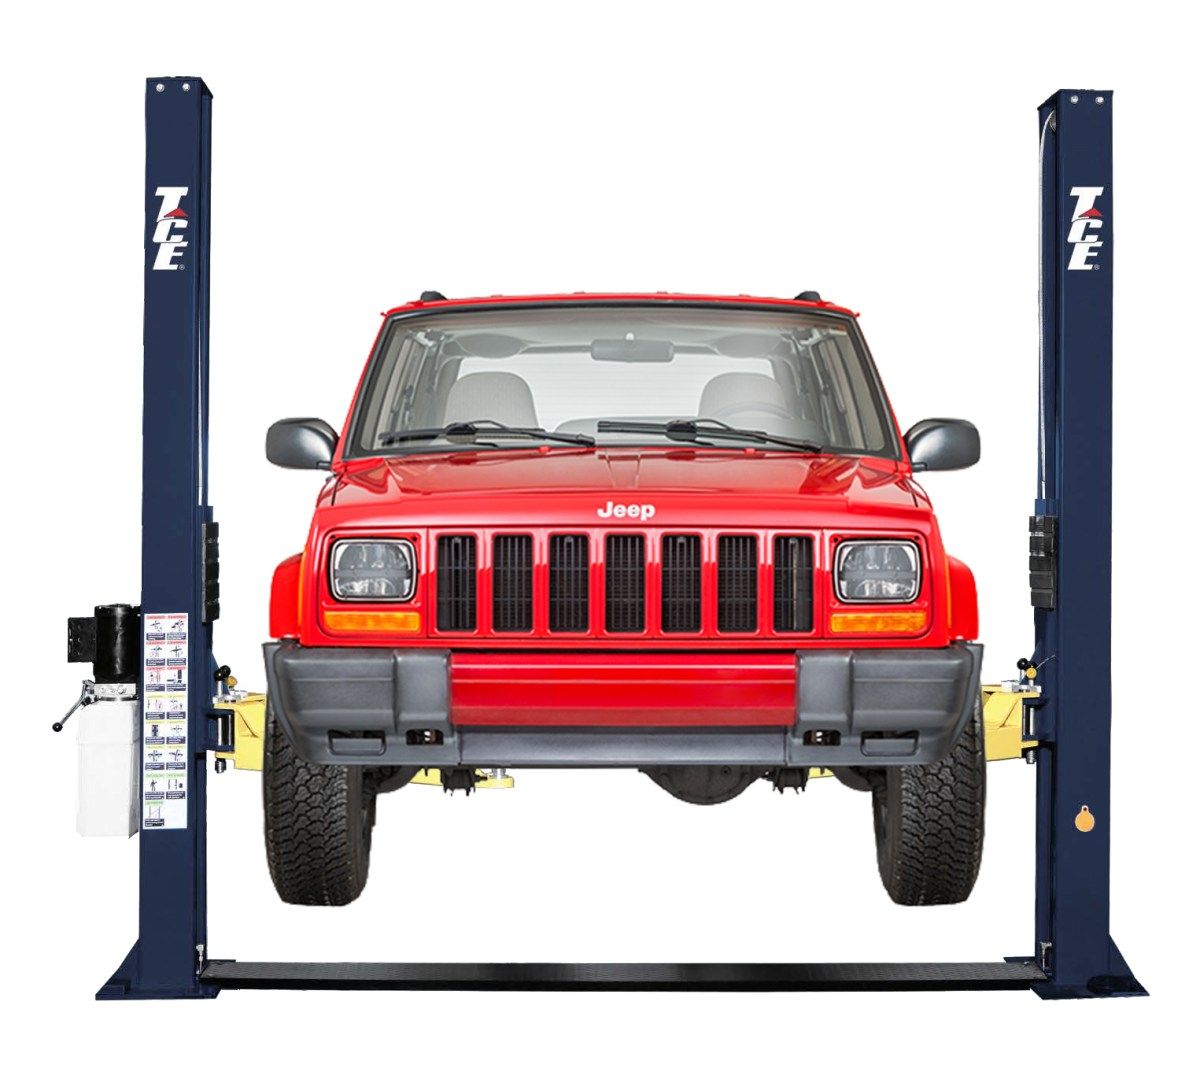 QJY240C_Jeep_TCE